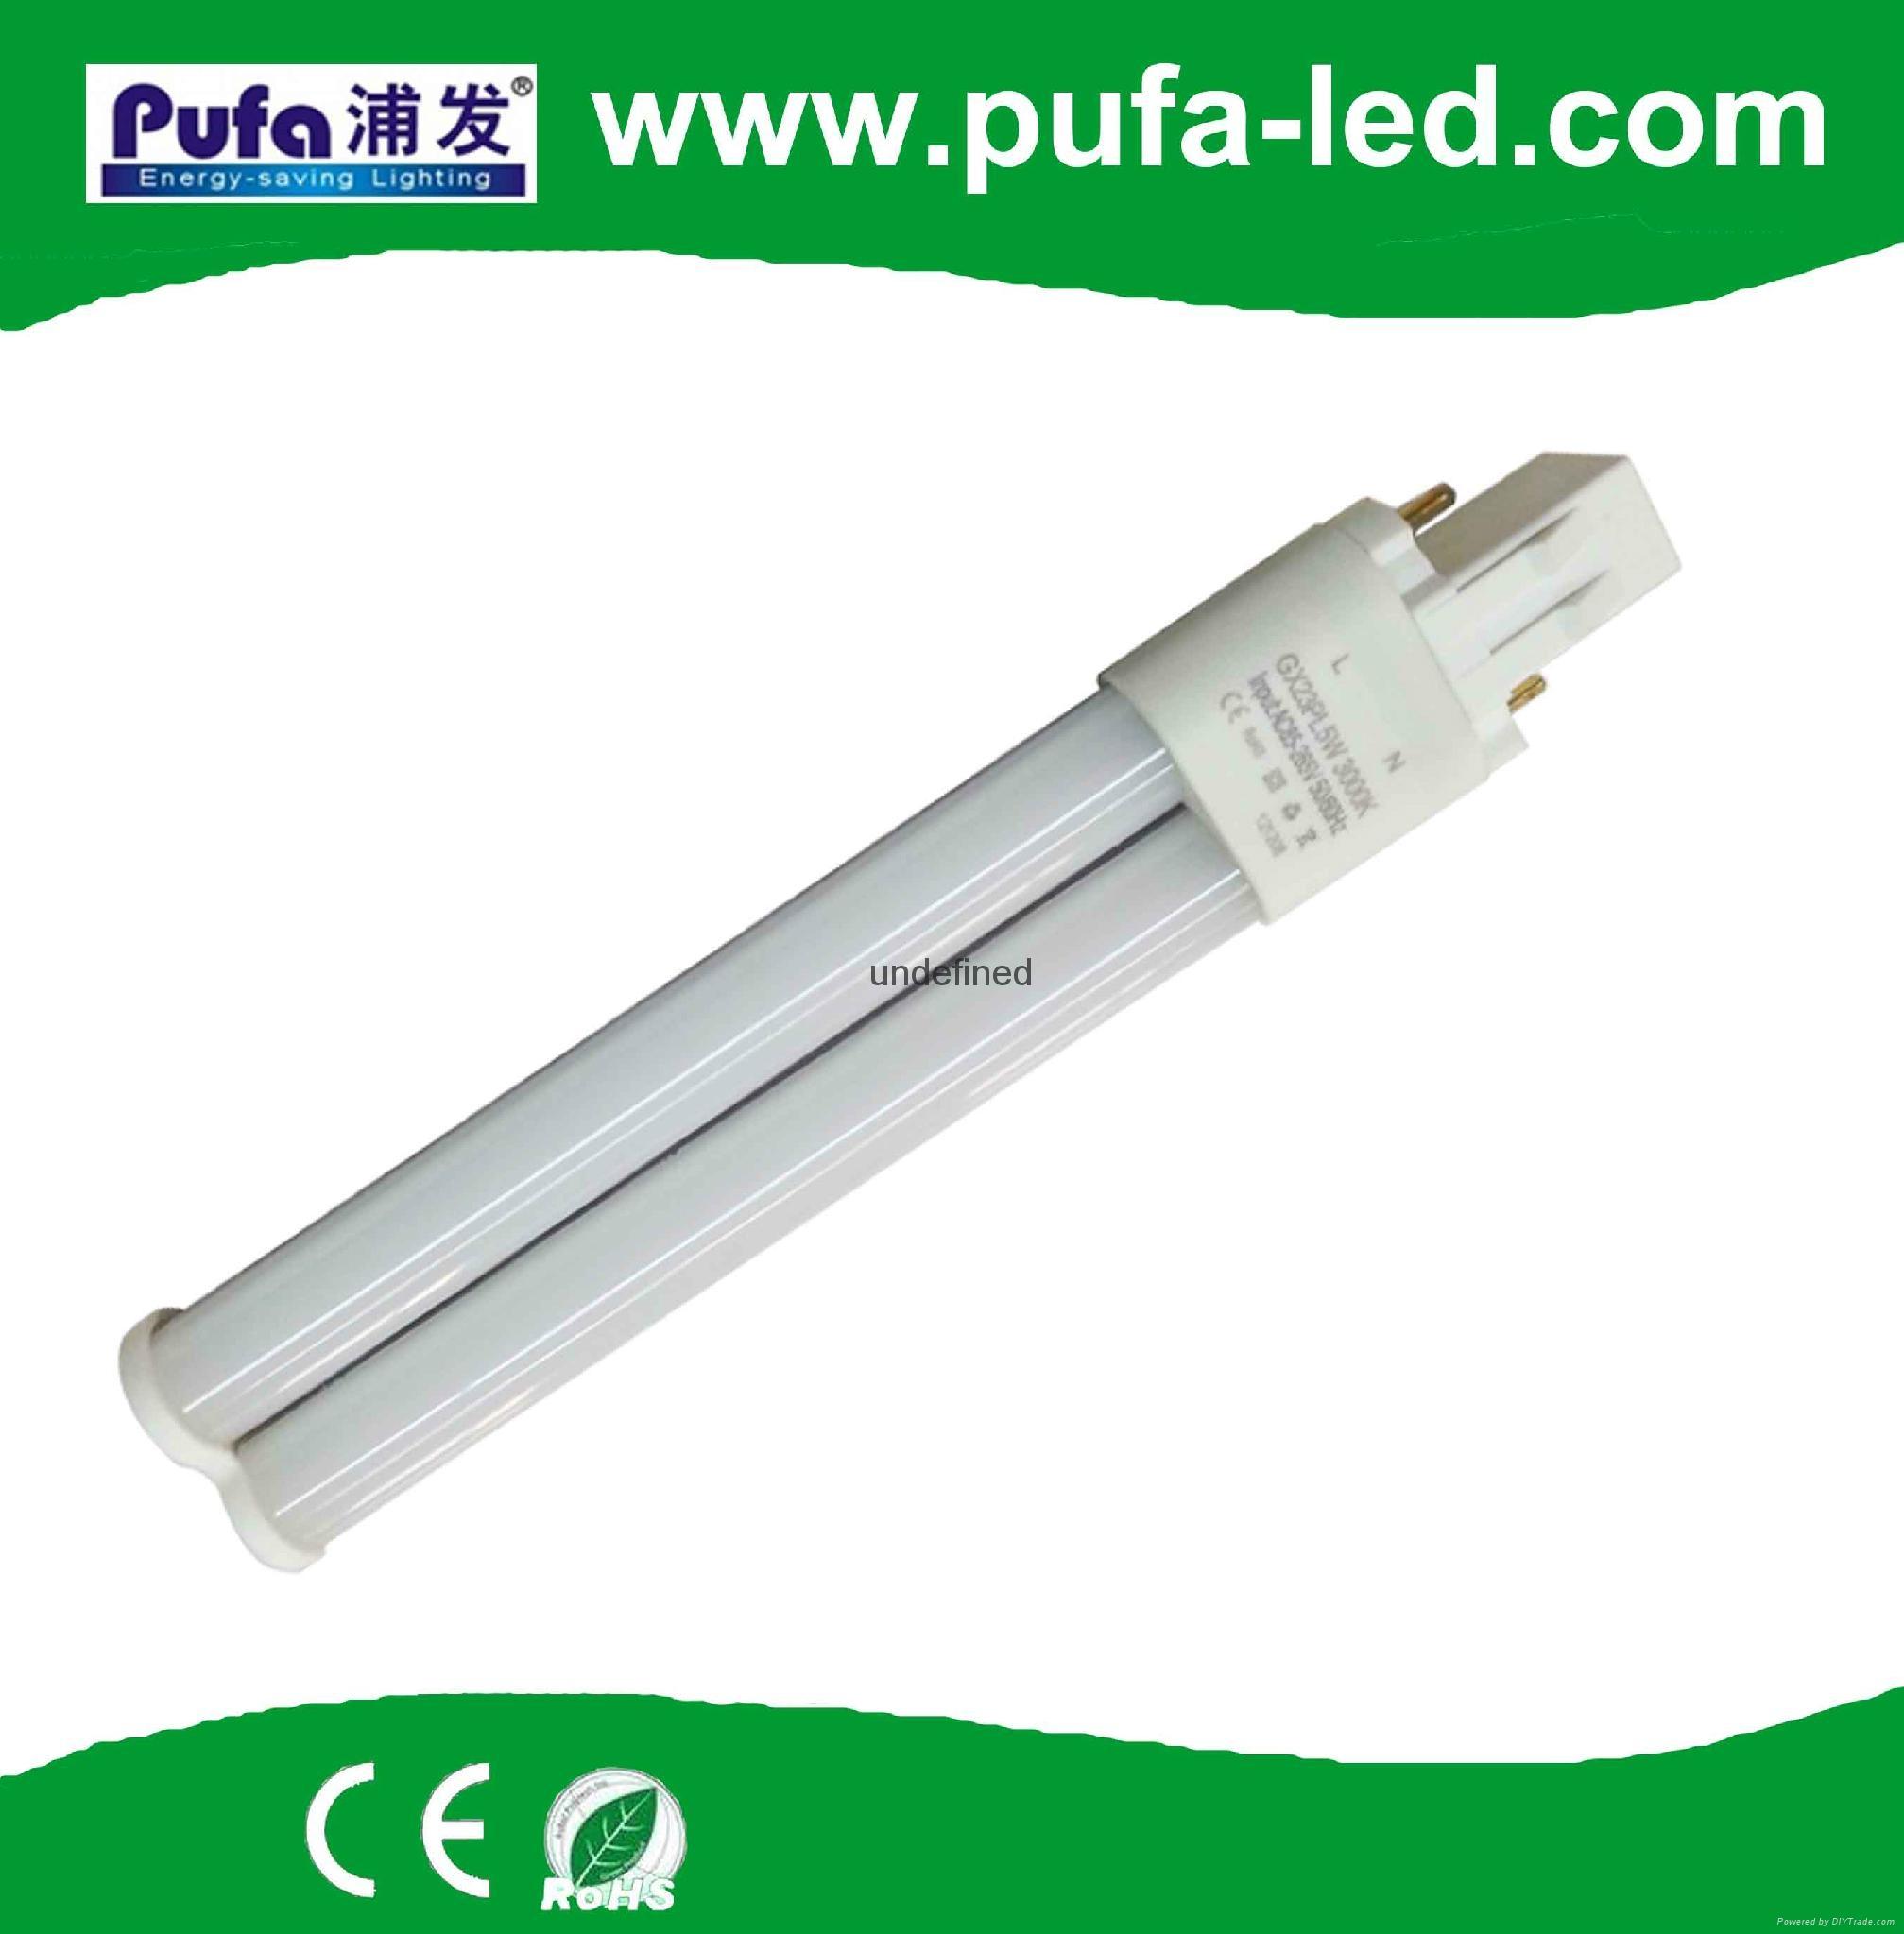 GX23 LED 橫插燈 9W  1